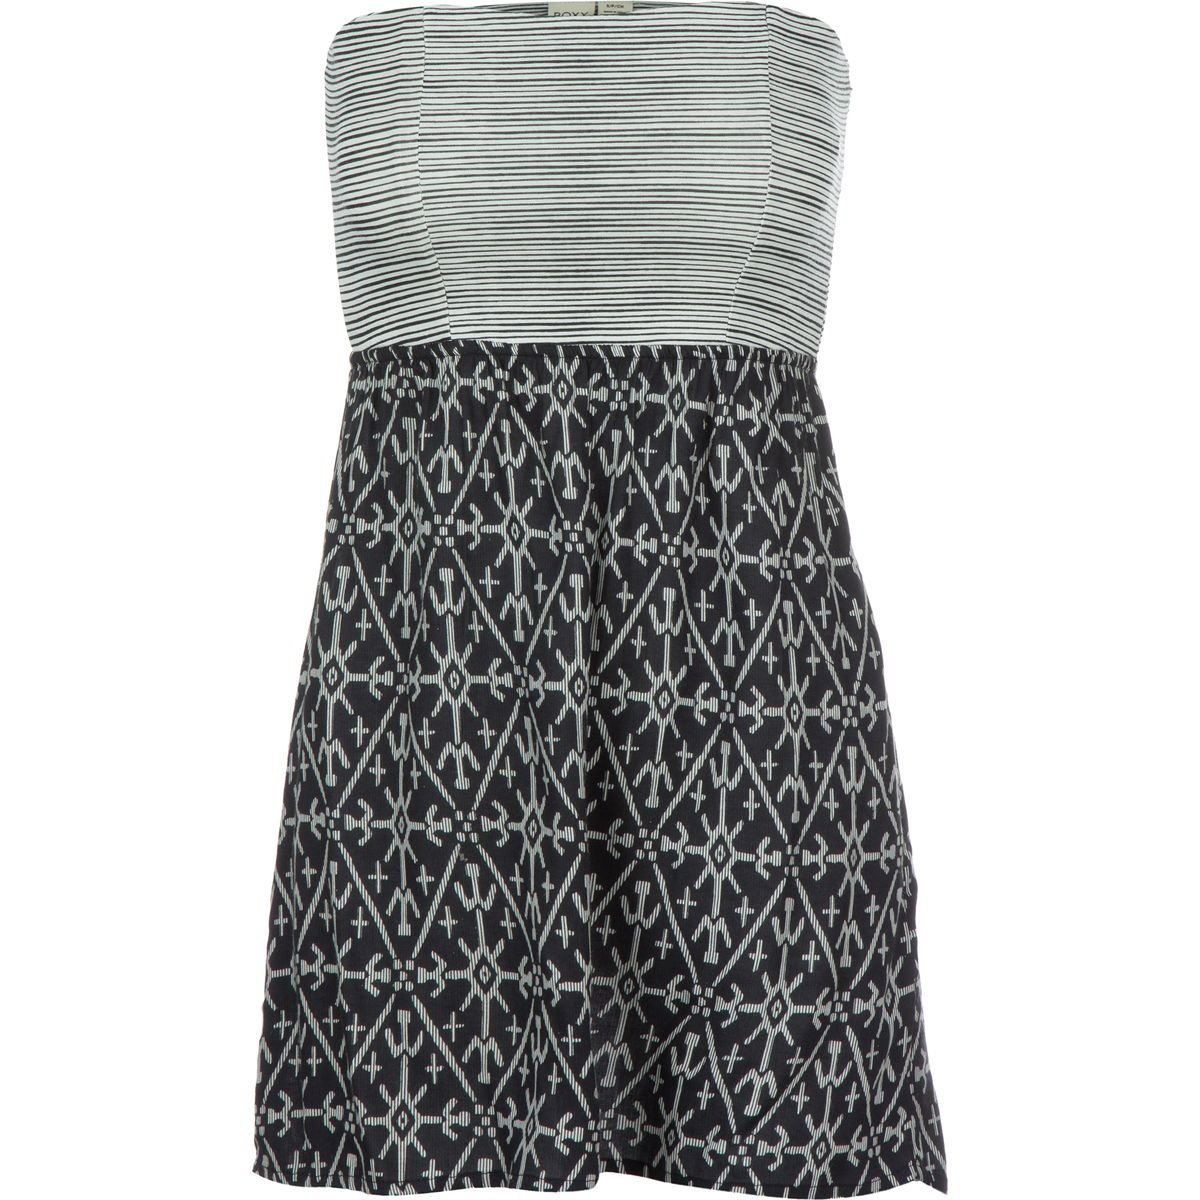 d96bcc6969 Roxy Womens Roxy Savage 3 - Woven Bandeau Dress - Women - M - Black True  Black Mirage Marking M at Amazon Women s Clothing store